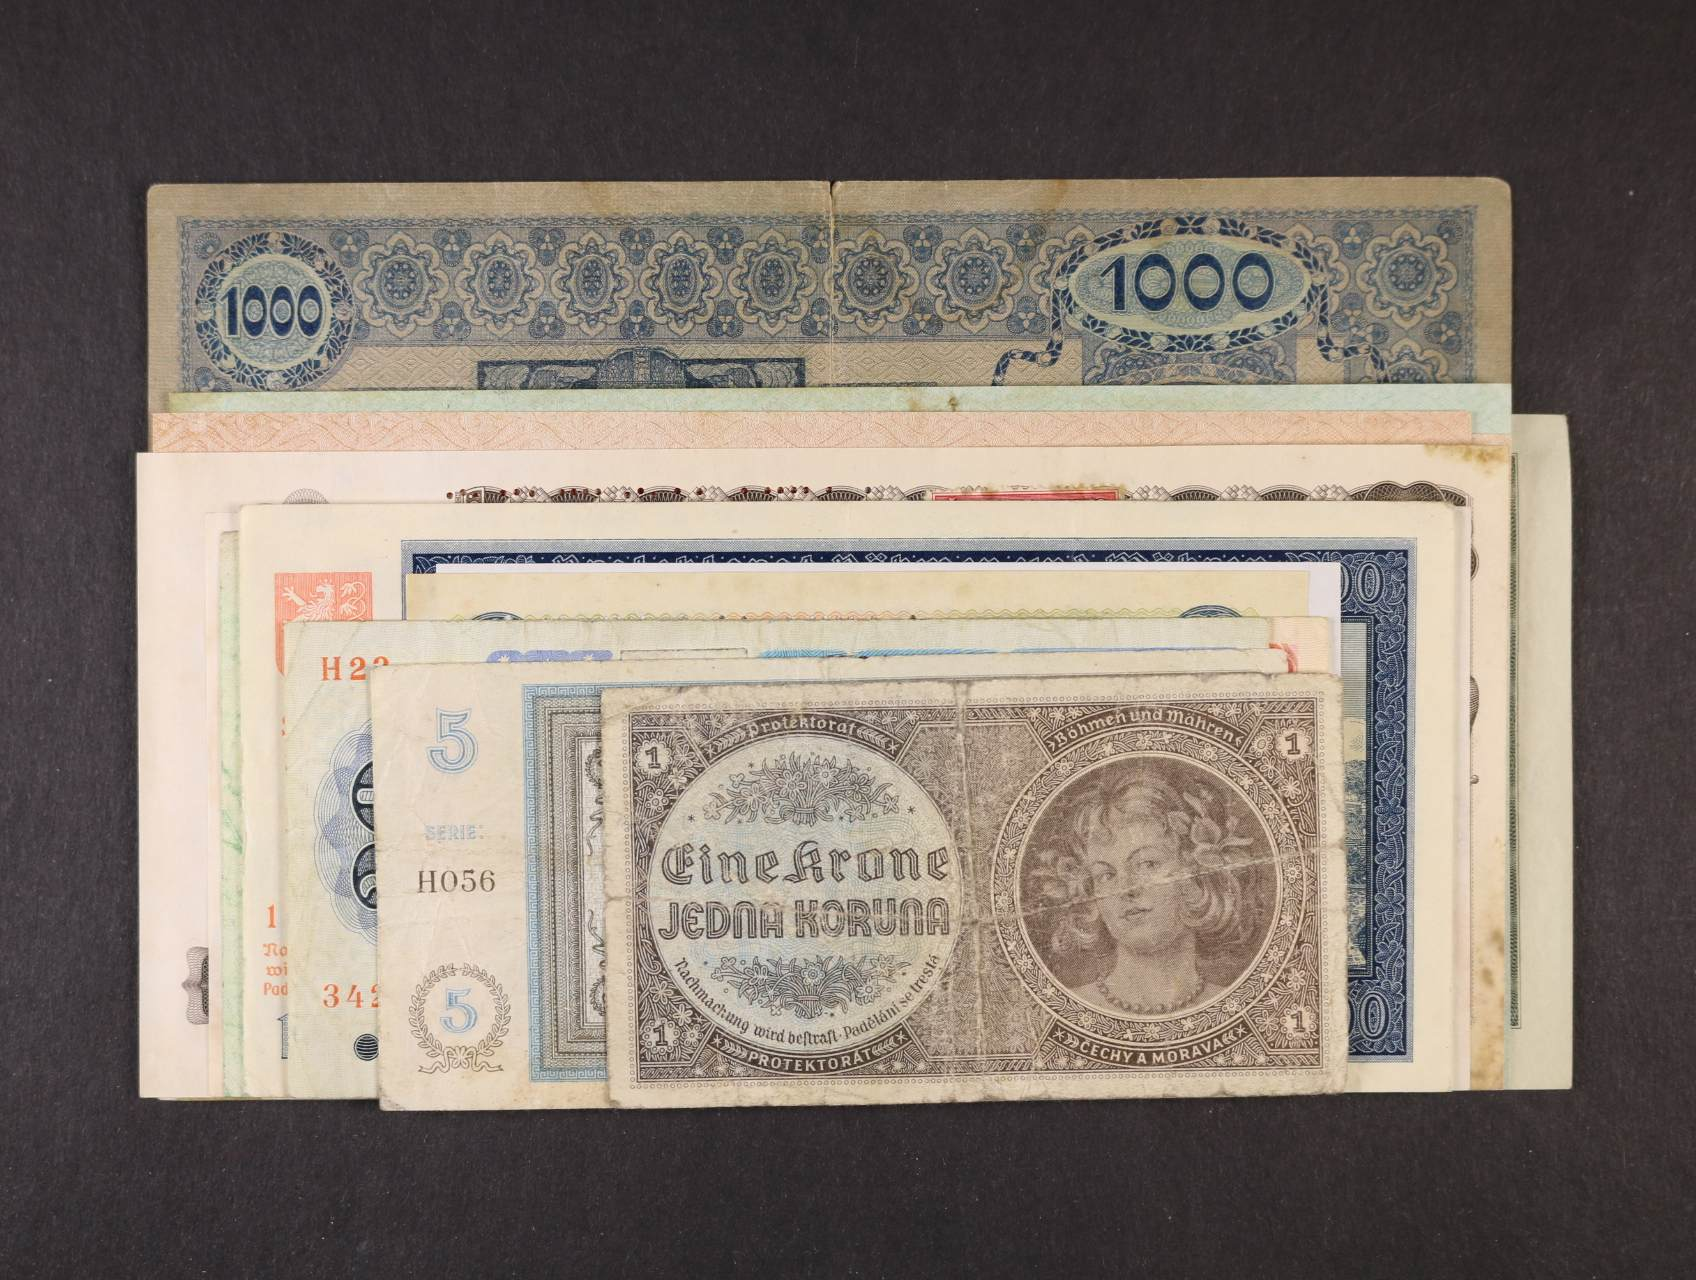 sestava 19 ks bankovek Československa, Protektorátu, České a Slovenské Republiky